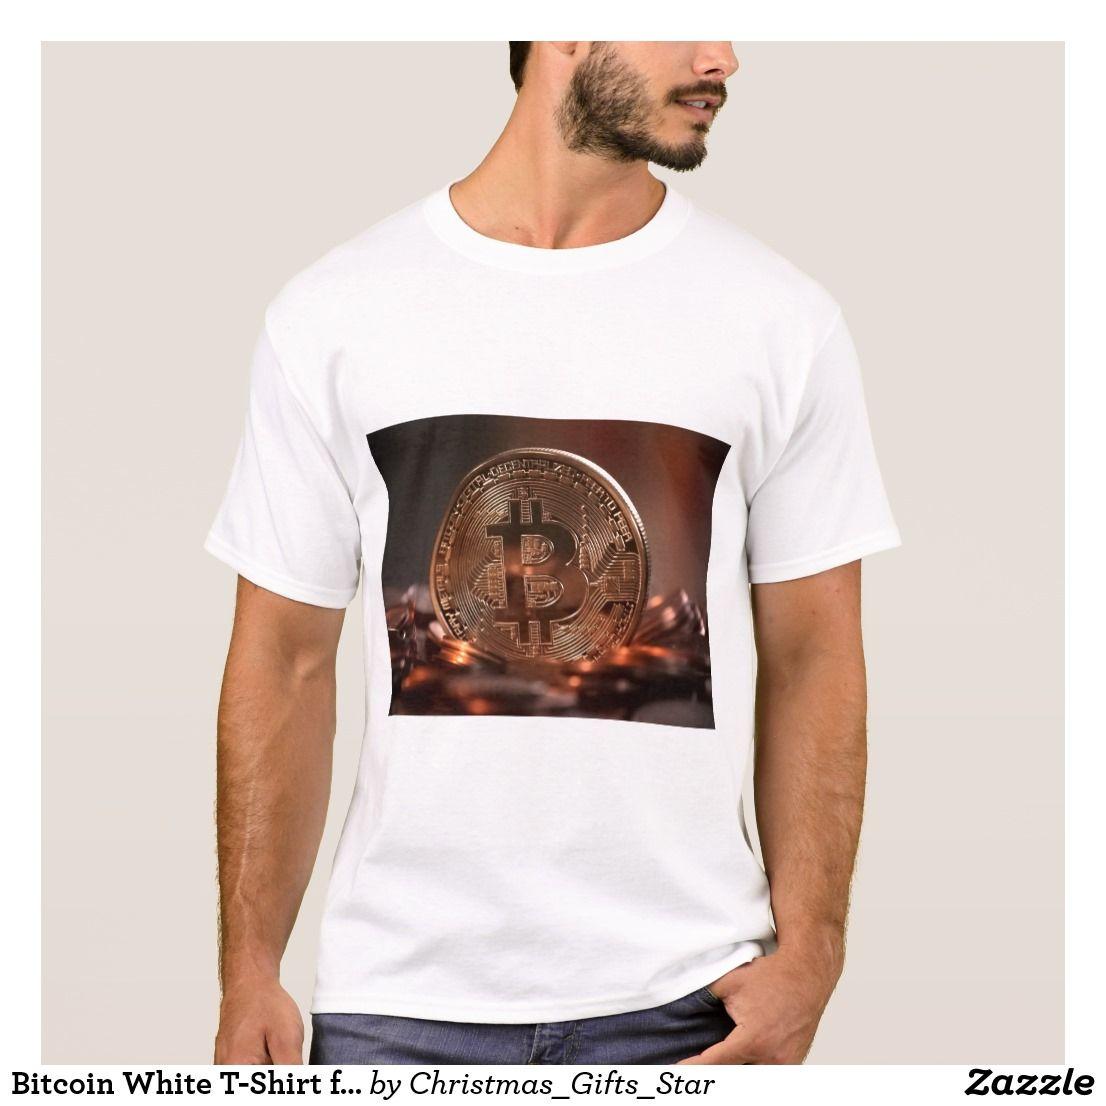 Bitcoin White T-Shirt for Men   Zazzle.co.uk   T shirt, Shirts, Mens tops